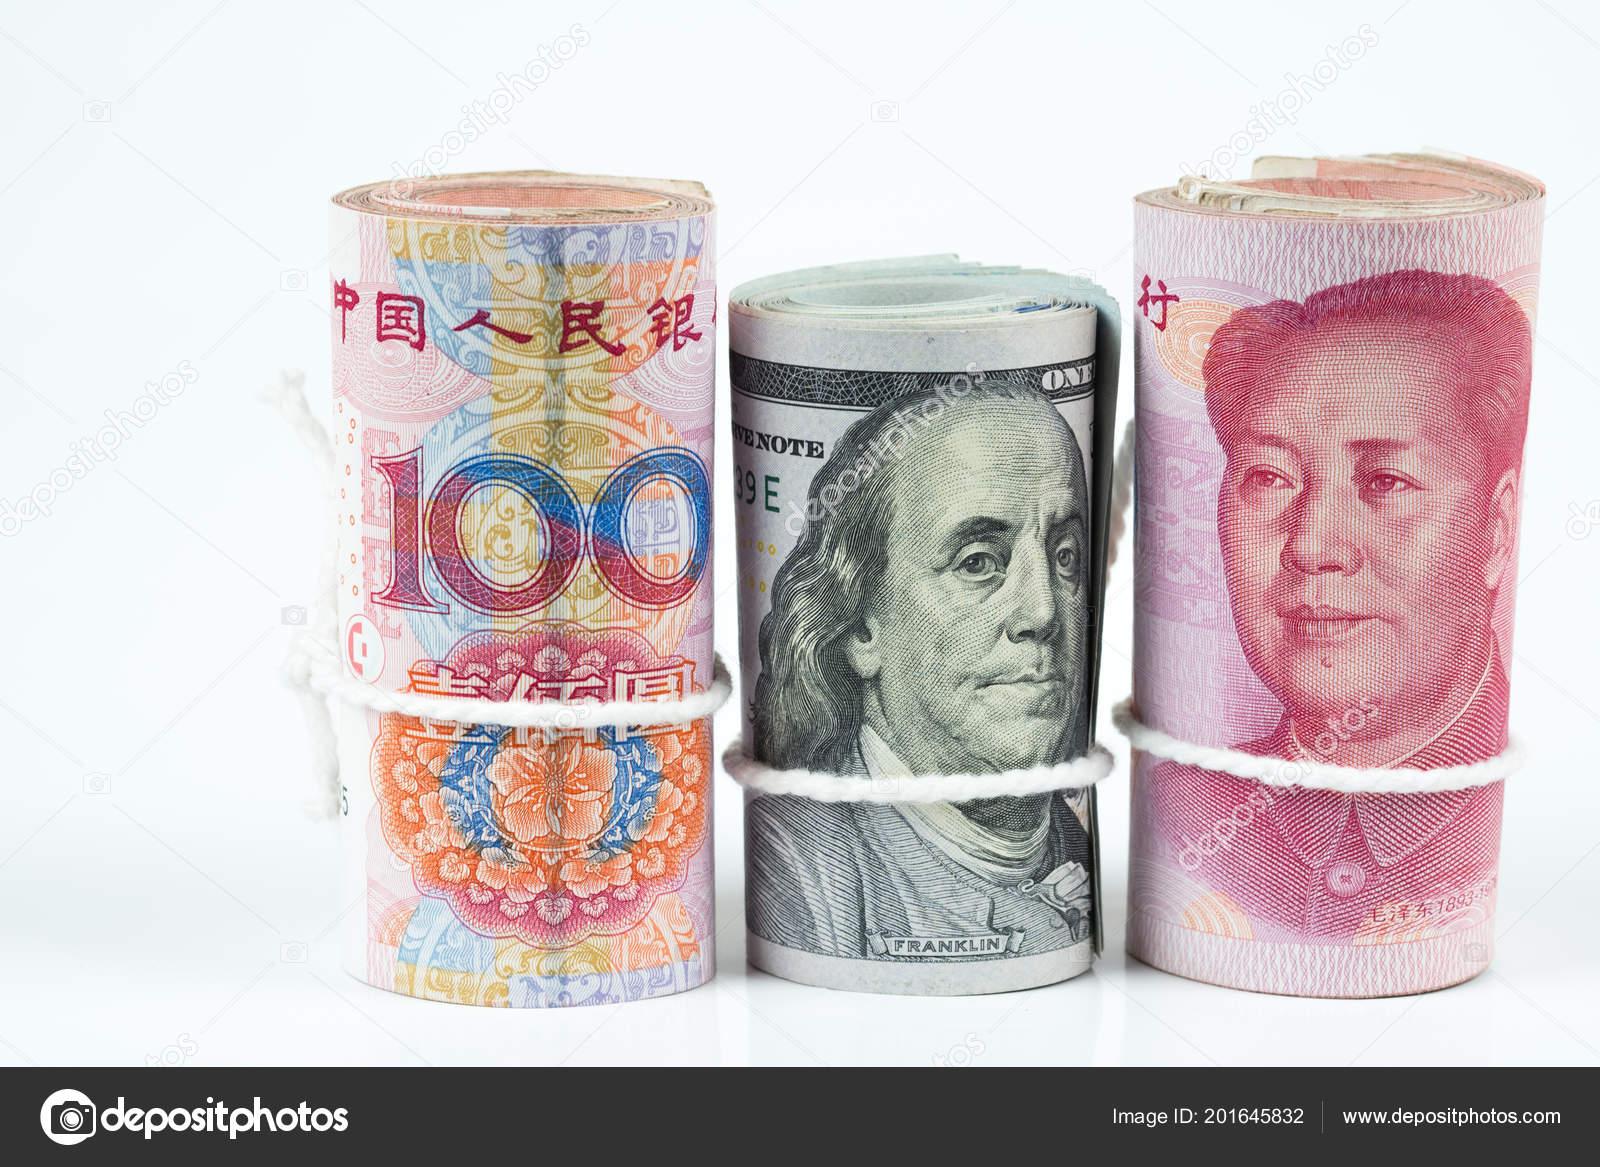 Rolls One Hundred Dollar Bills Chinese Yuan Banknotes White Robe Stock Photo C Cherayut000 201645832